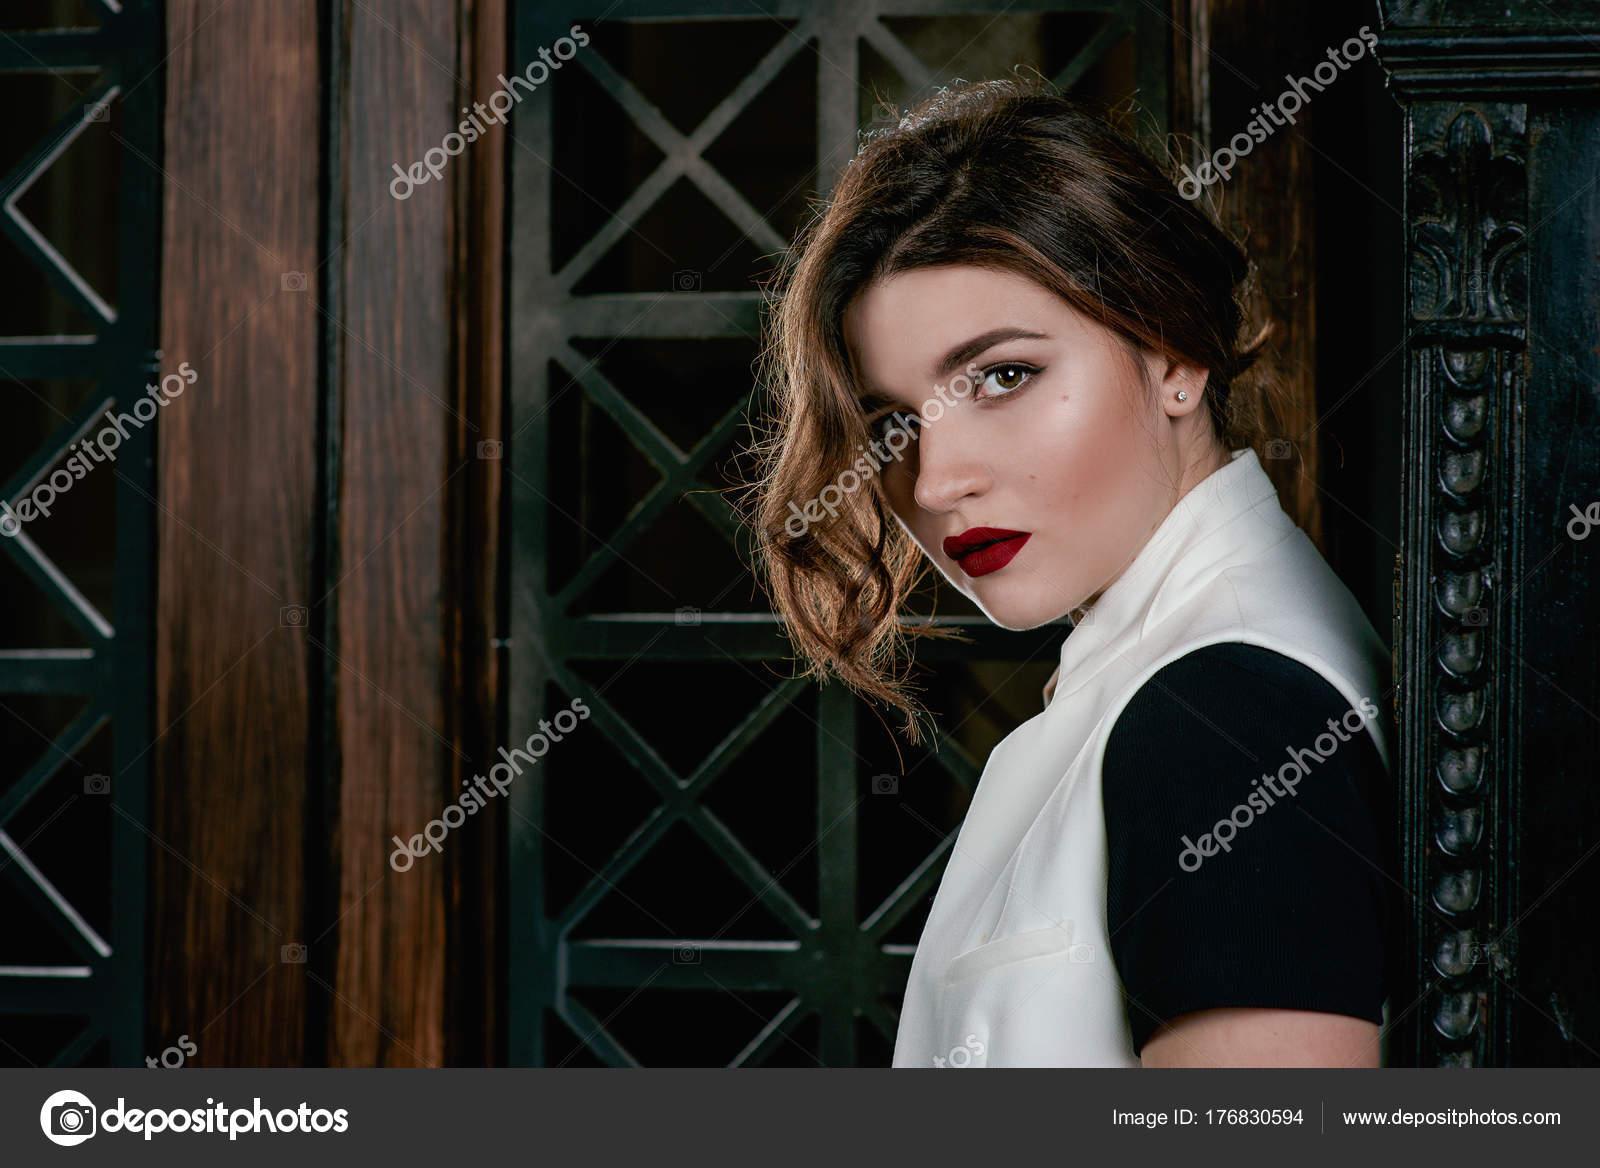 e0adaf6d93d3 Portraite Του Νεαρή Όμορφη Γυναίκα Λυπημένος Κοντά Καστανά Μαλλιά ...